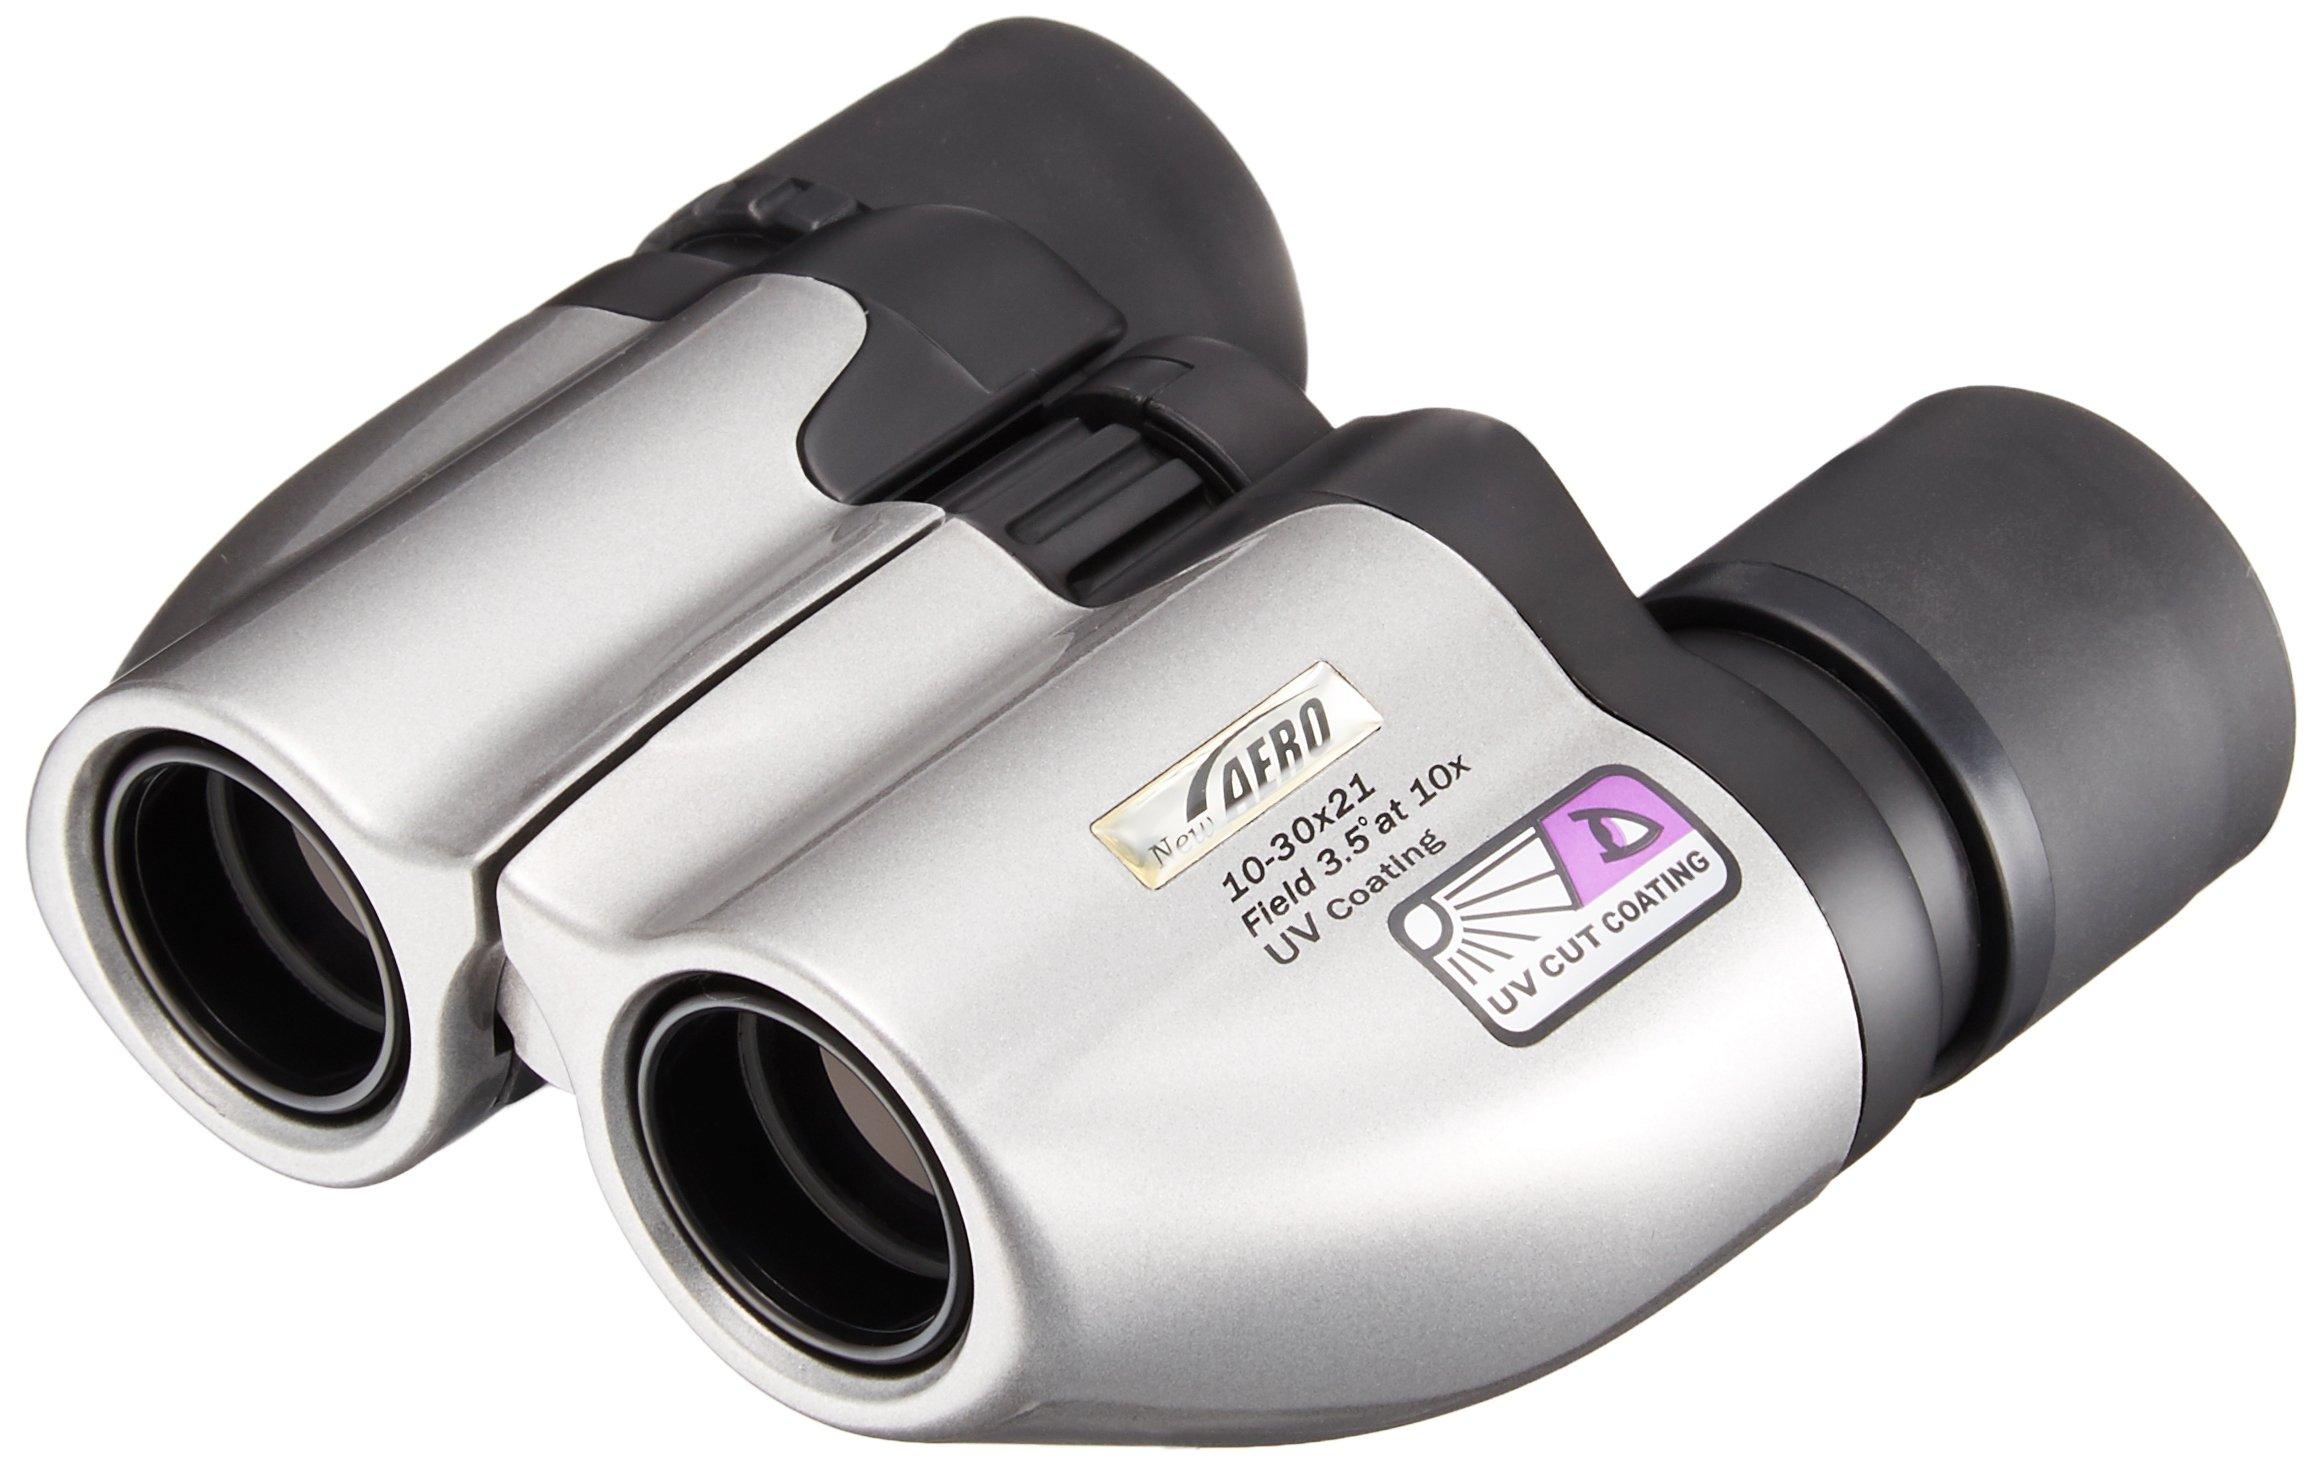 Kenko Binoculars New Aero 10-30x21 UV Zoom Silver by Kenko